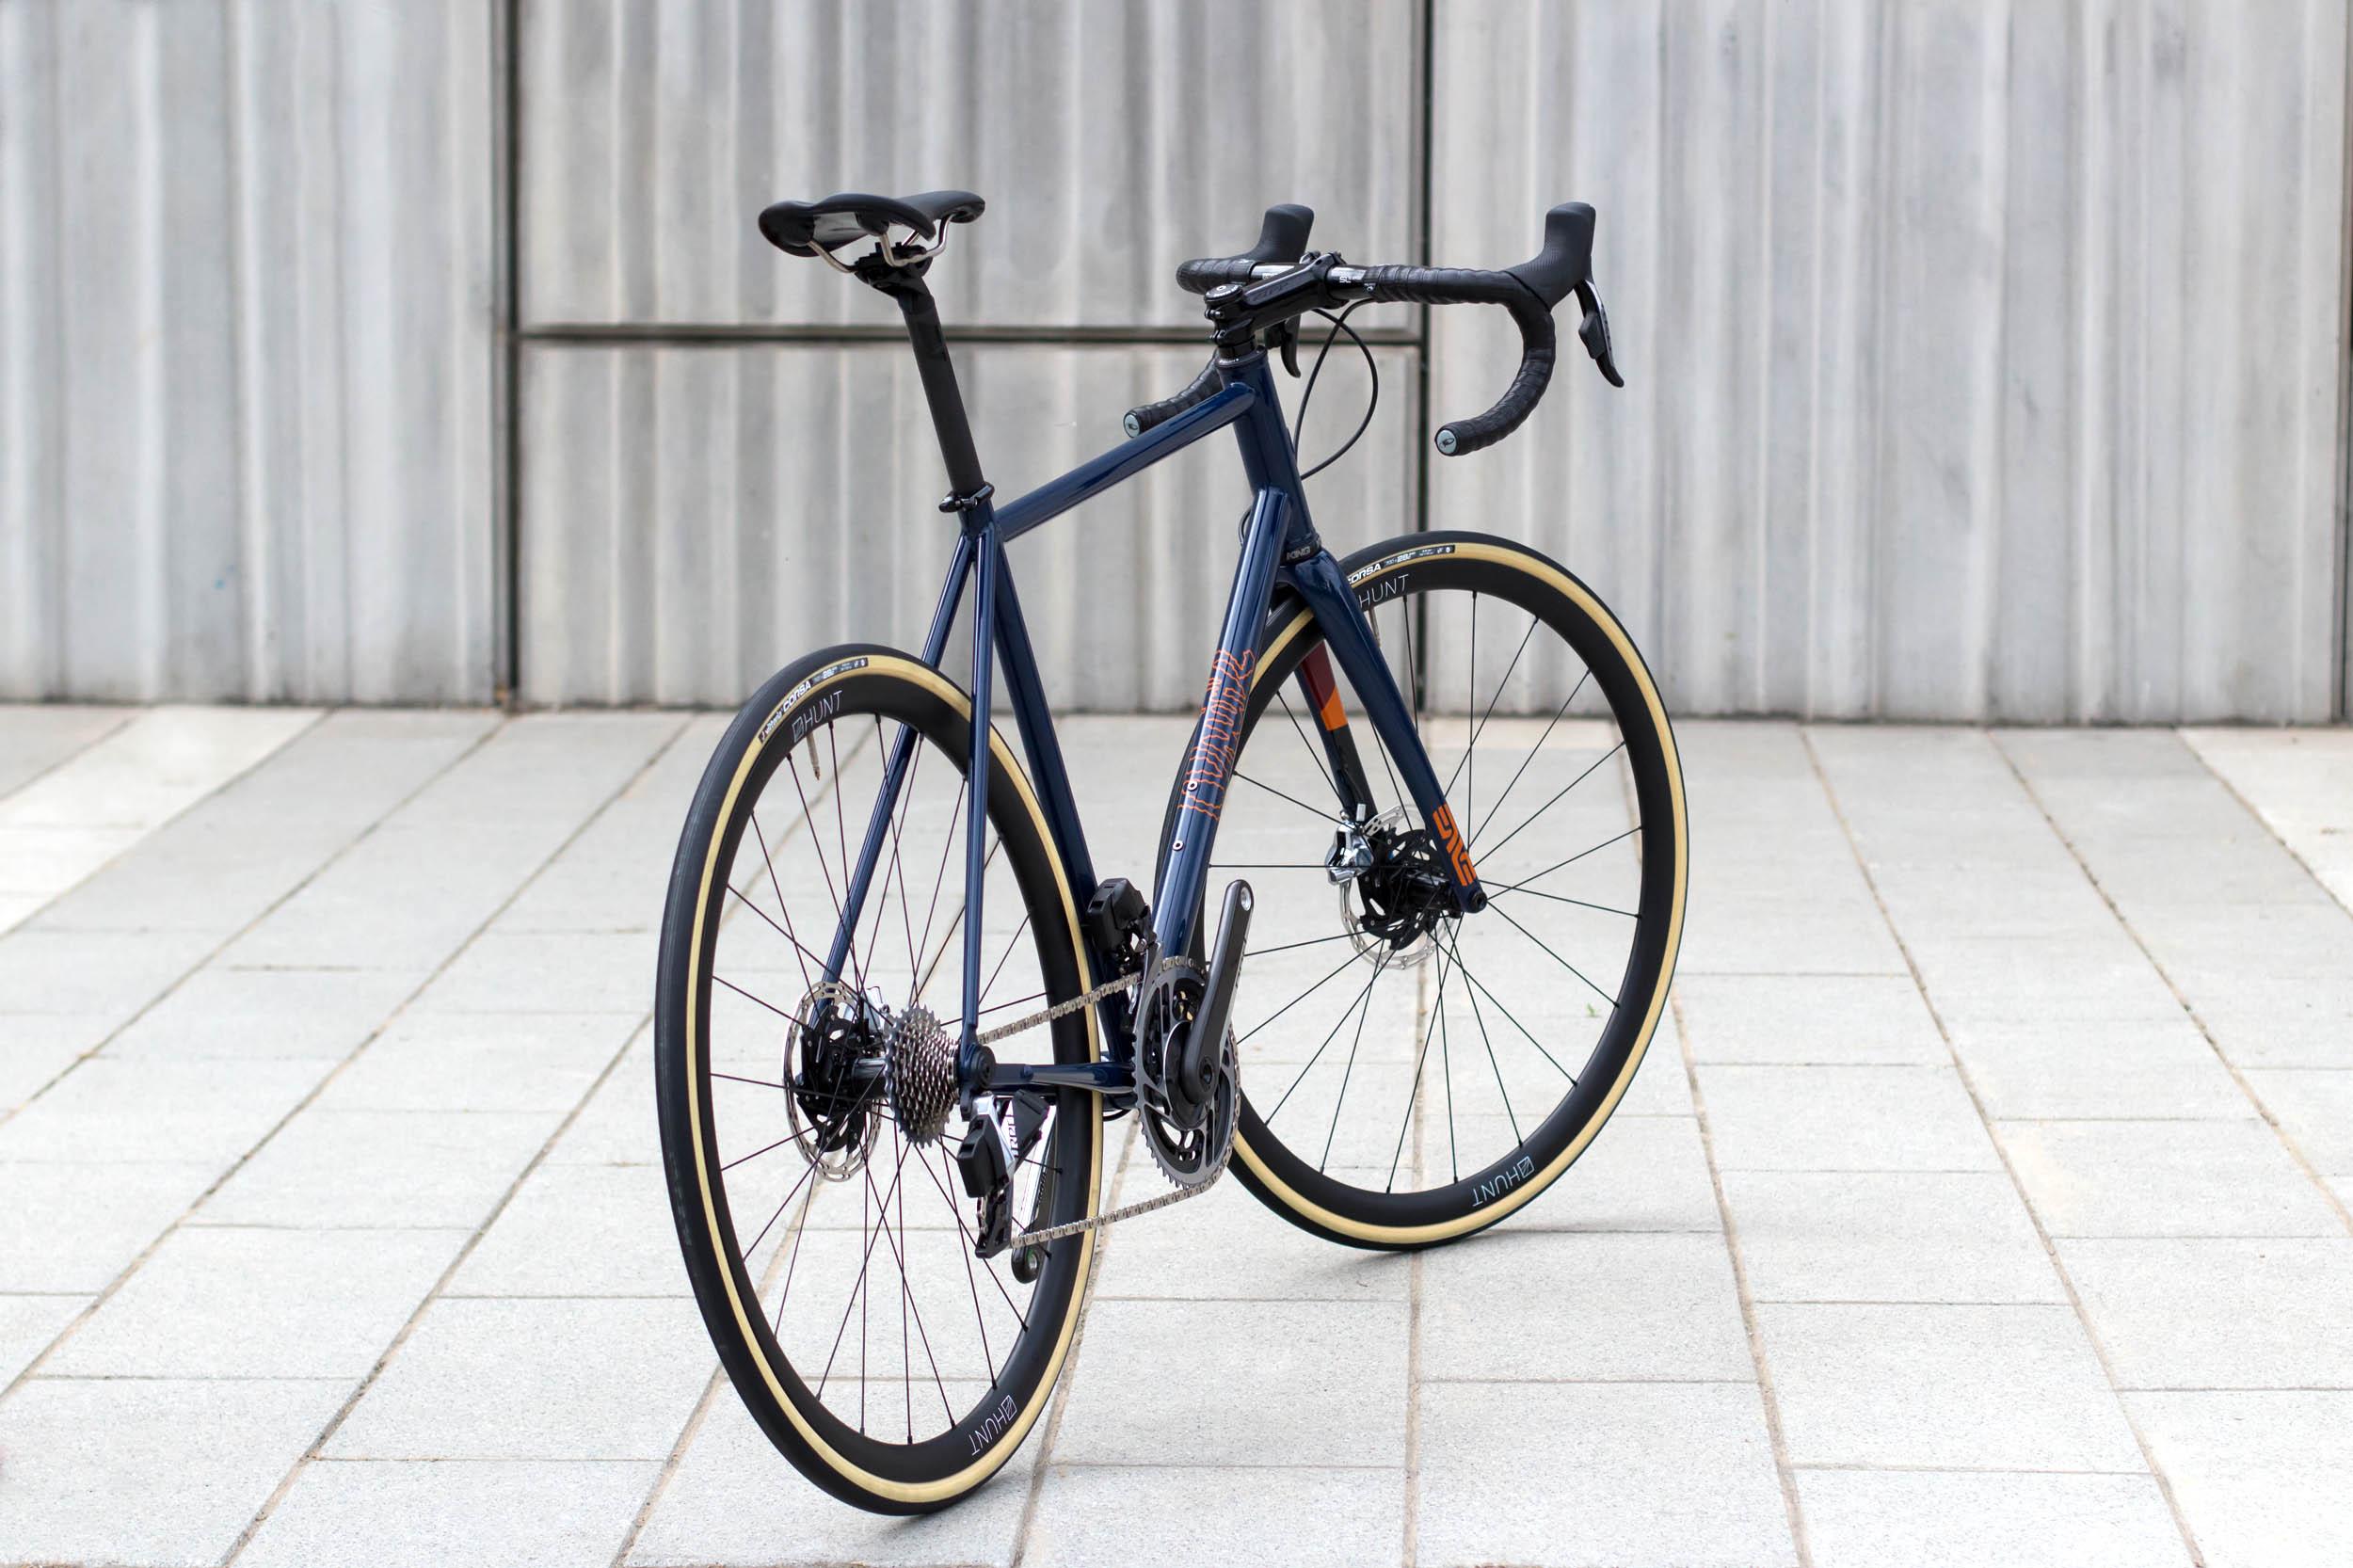 quirk_cycles_charlie_sheldon_durmitor_11.jpg